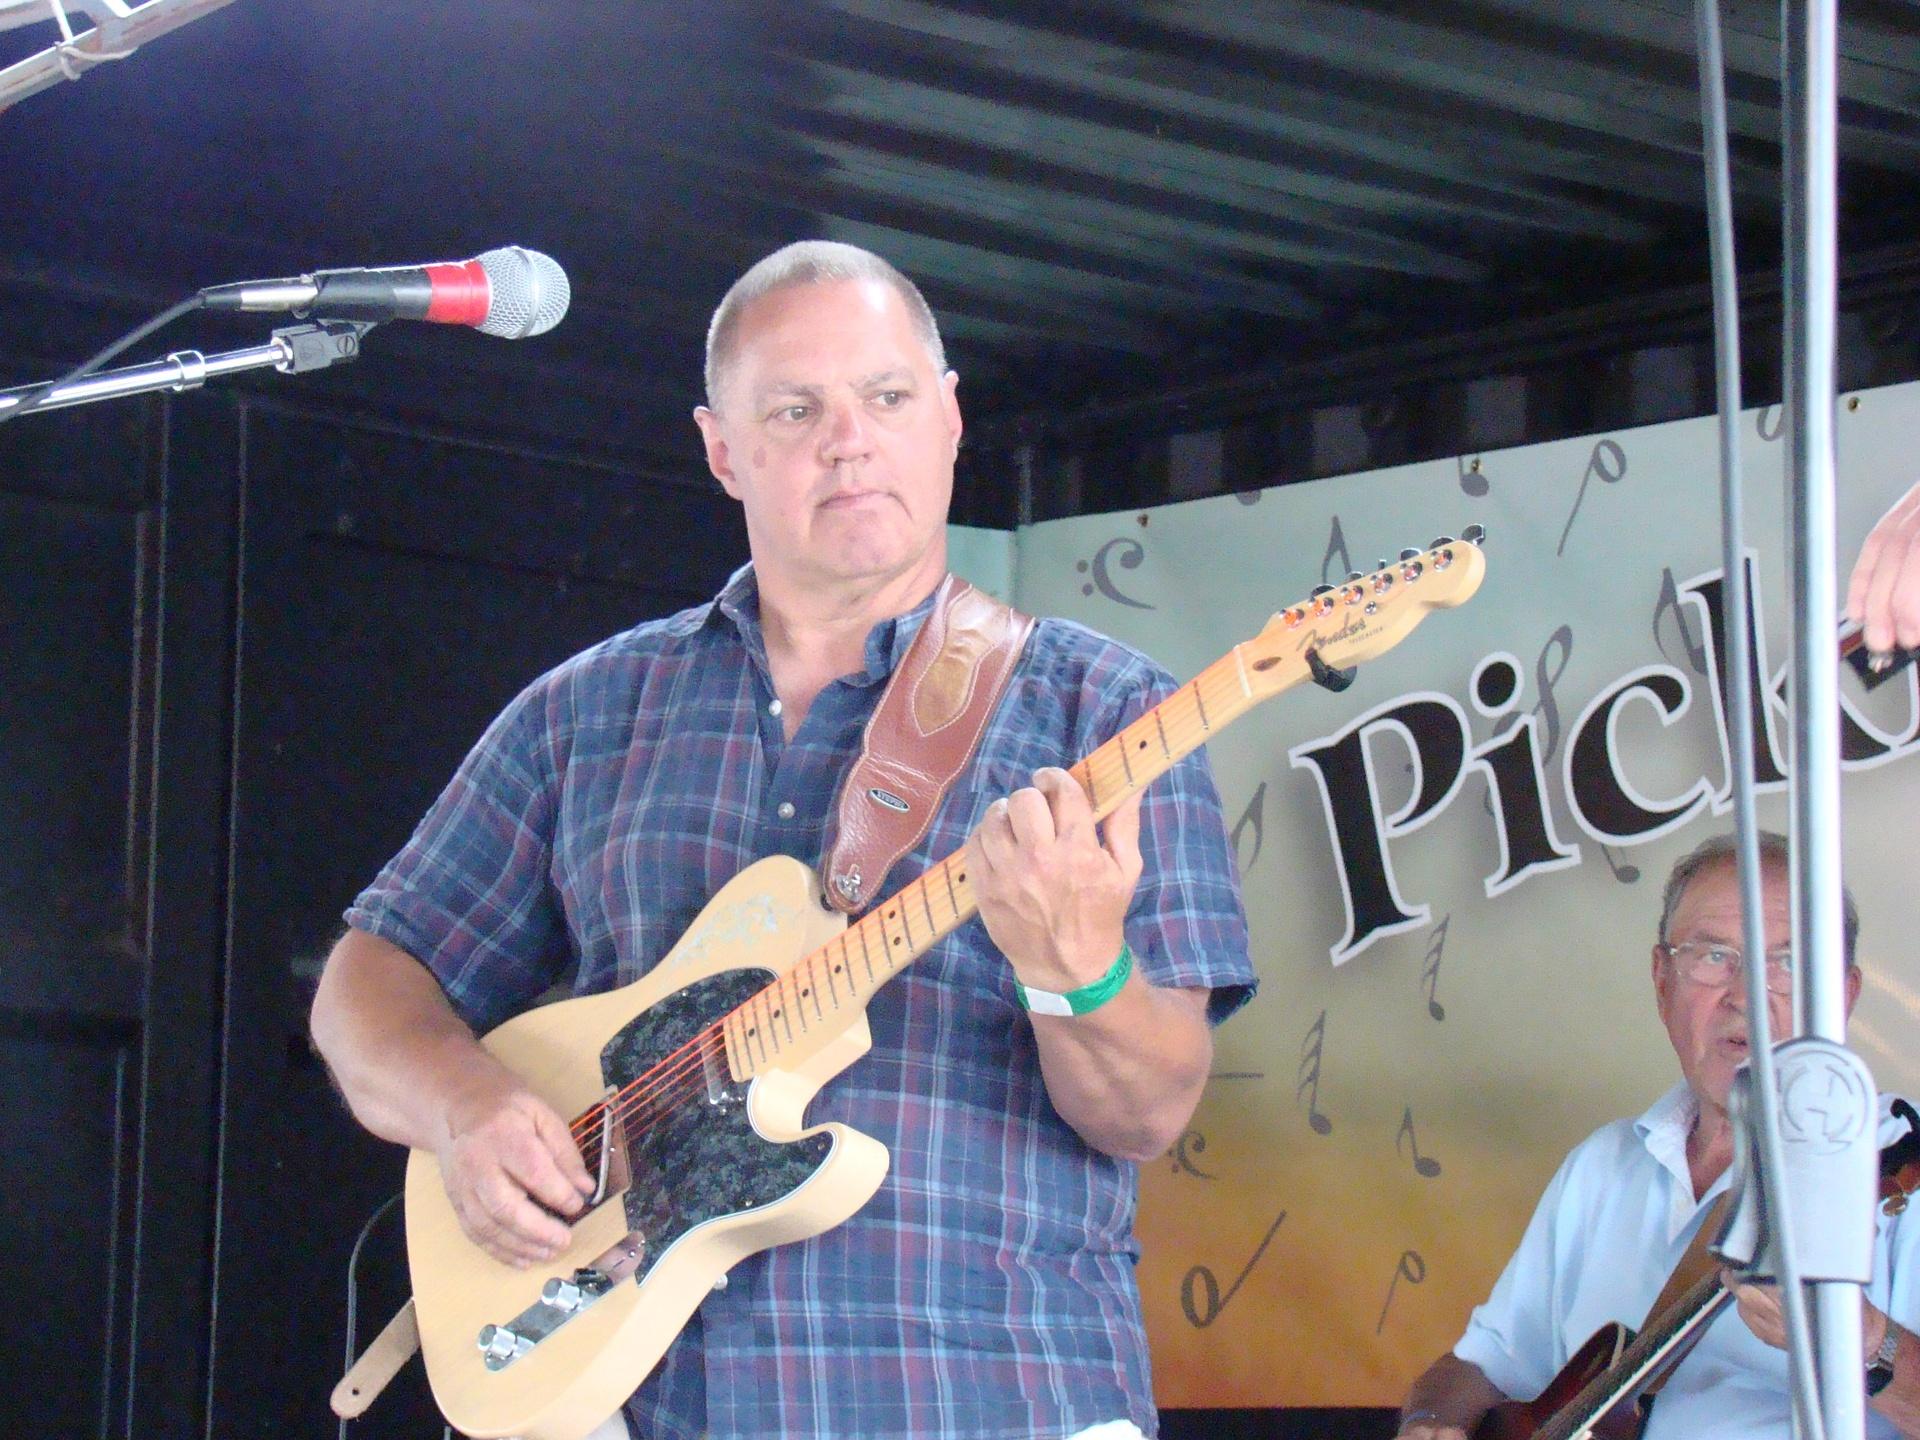 Pickin In The Park Festival in Shelburne